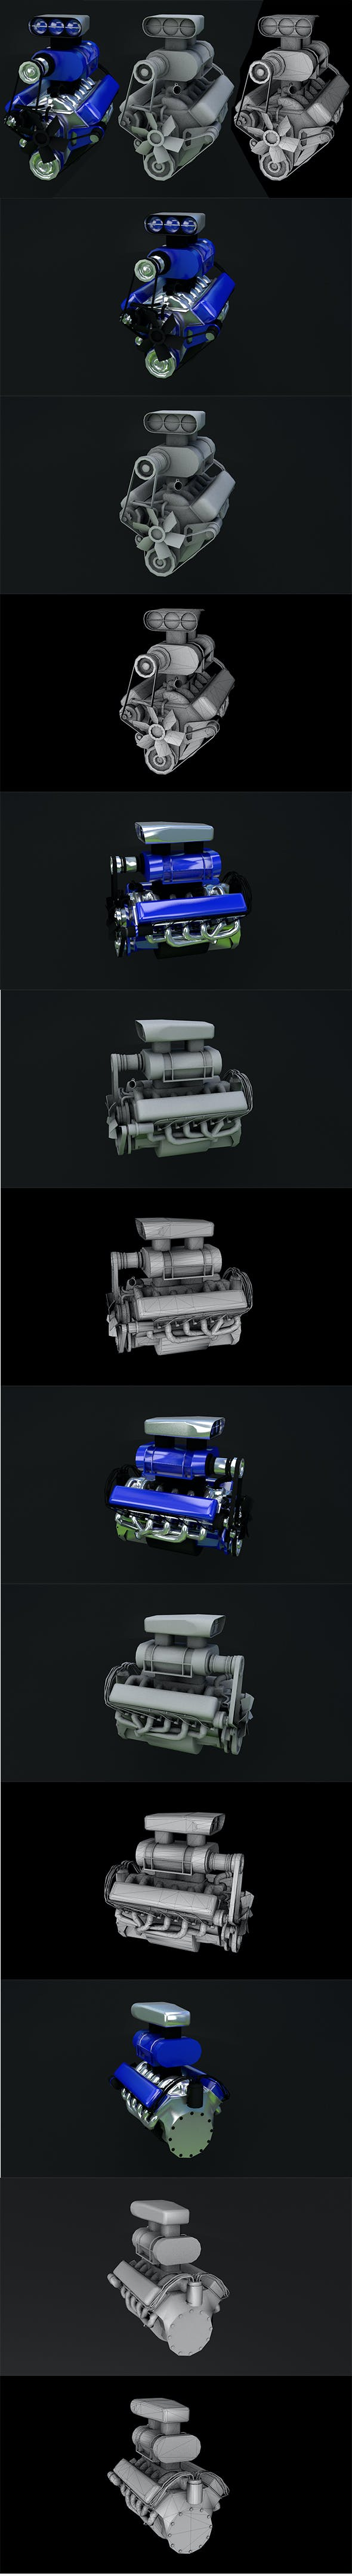 turbo engine Full details - 3DOcean Item for Sale